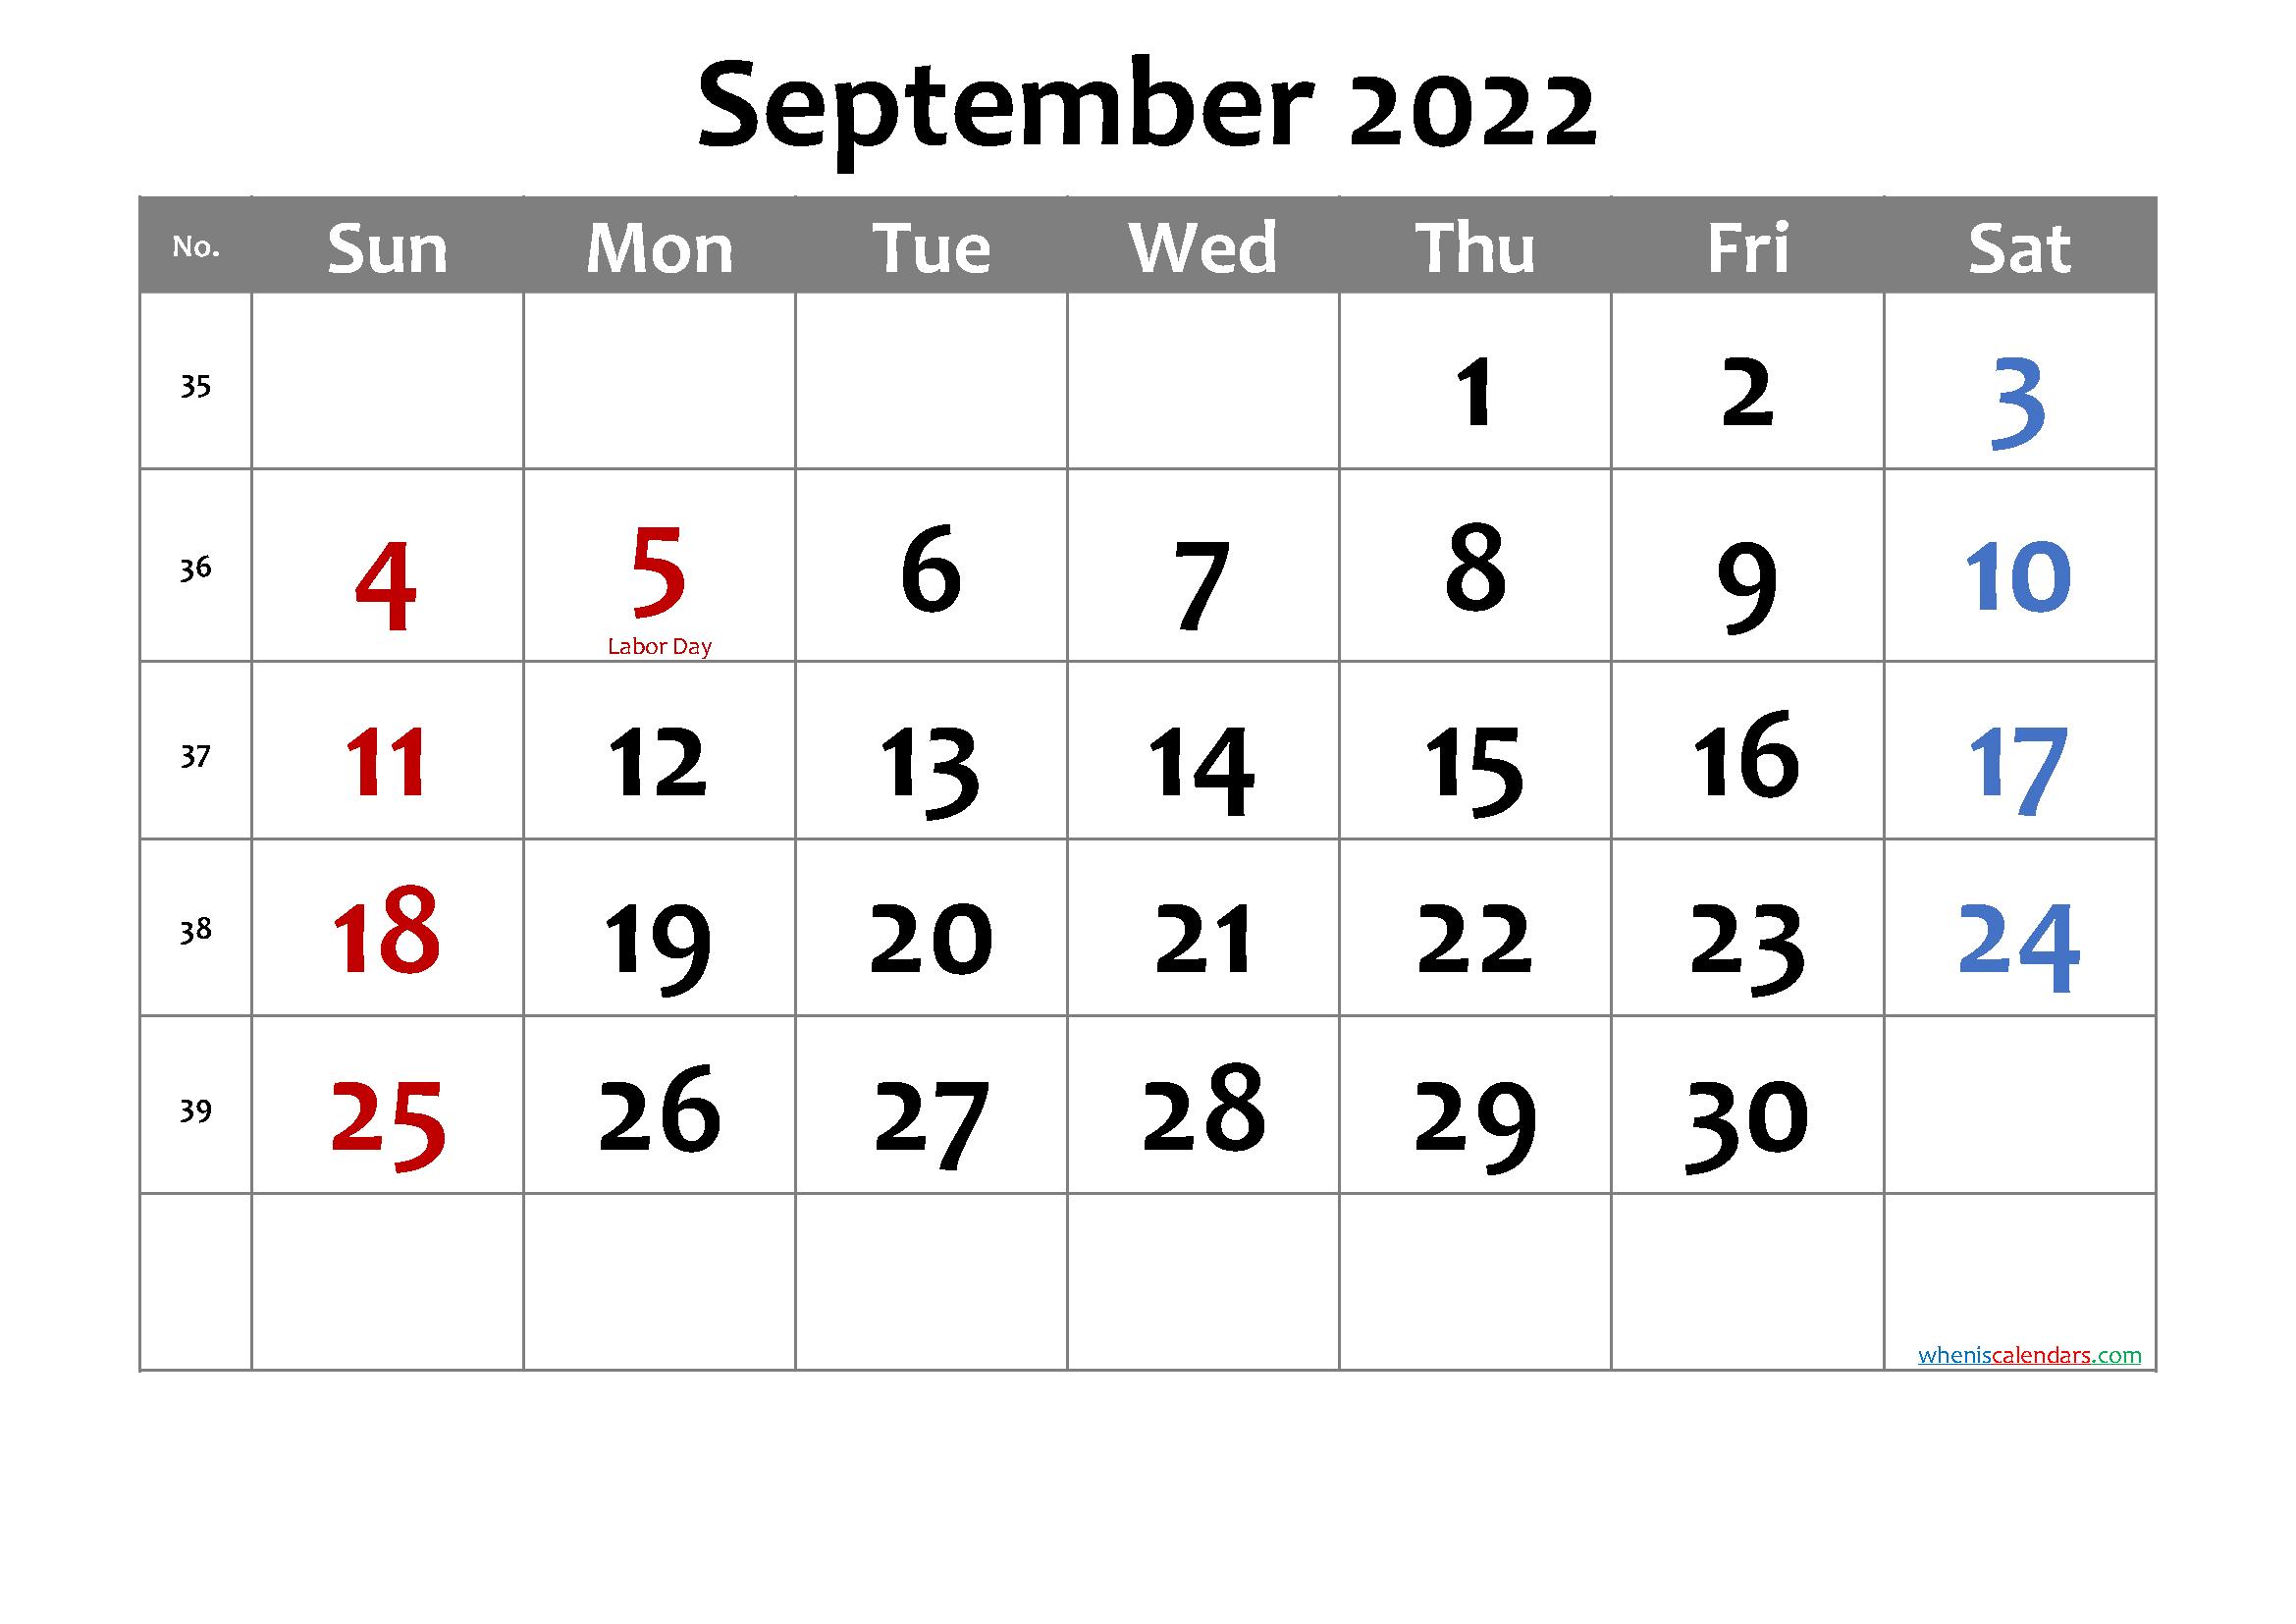 Free Printable September 2022 Calendar with Holidays